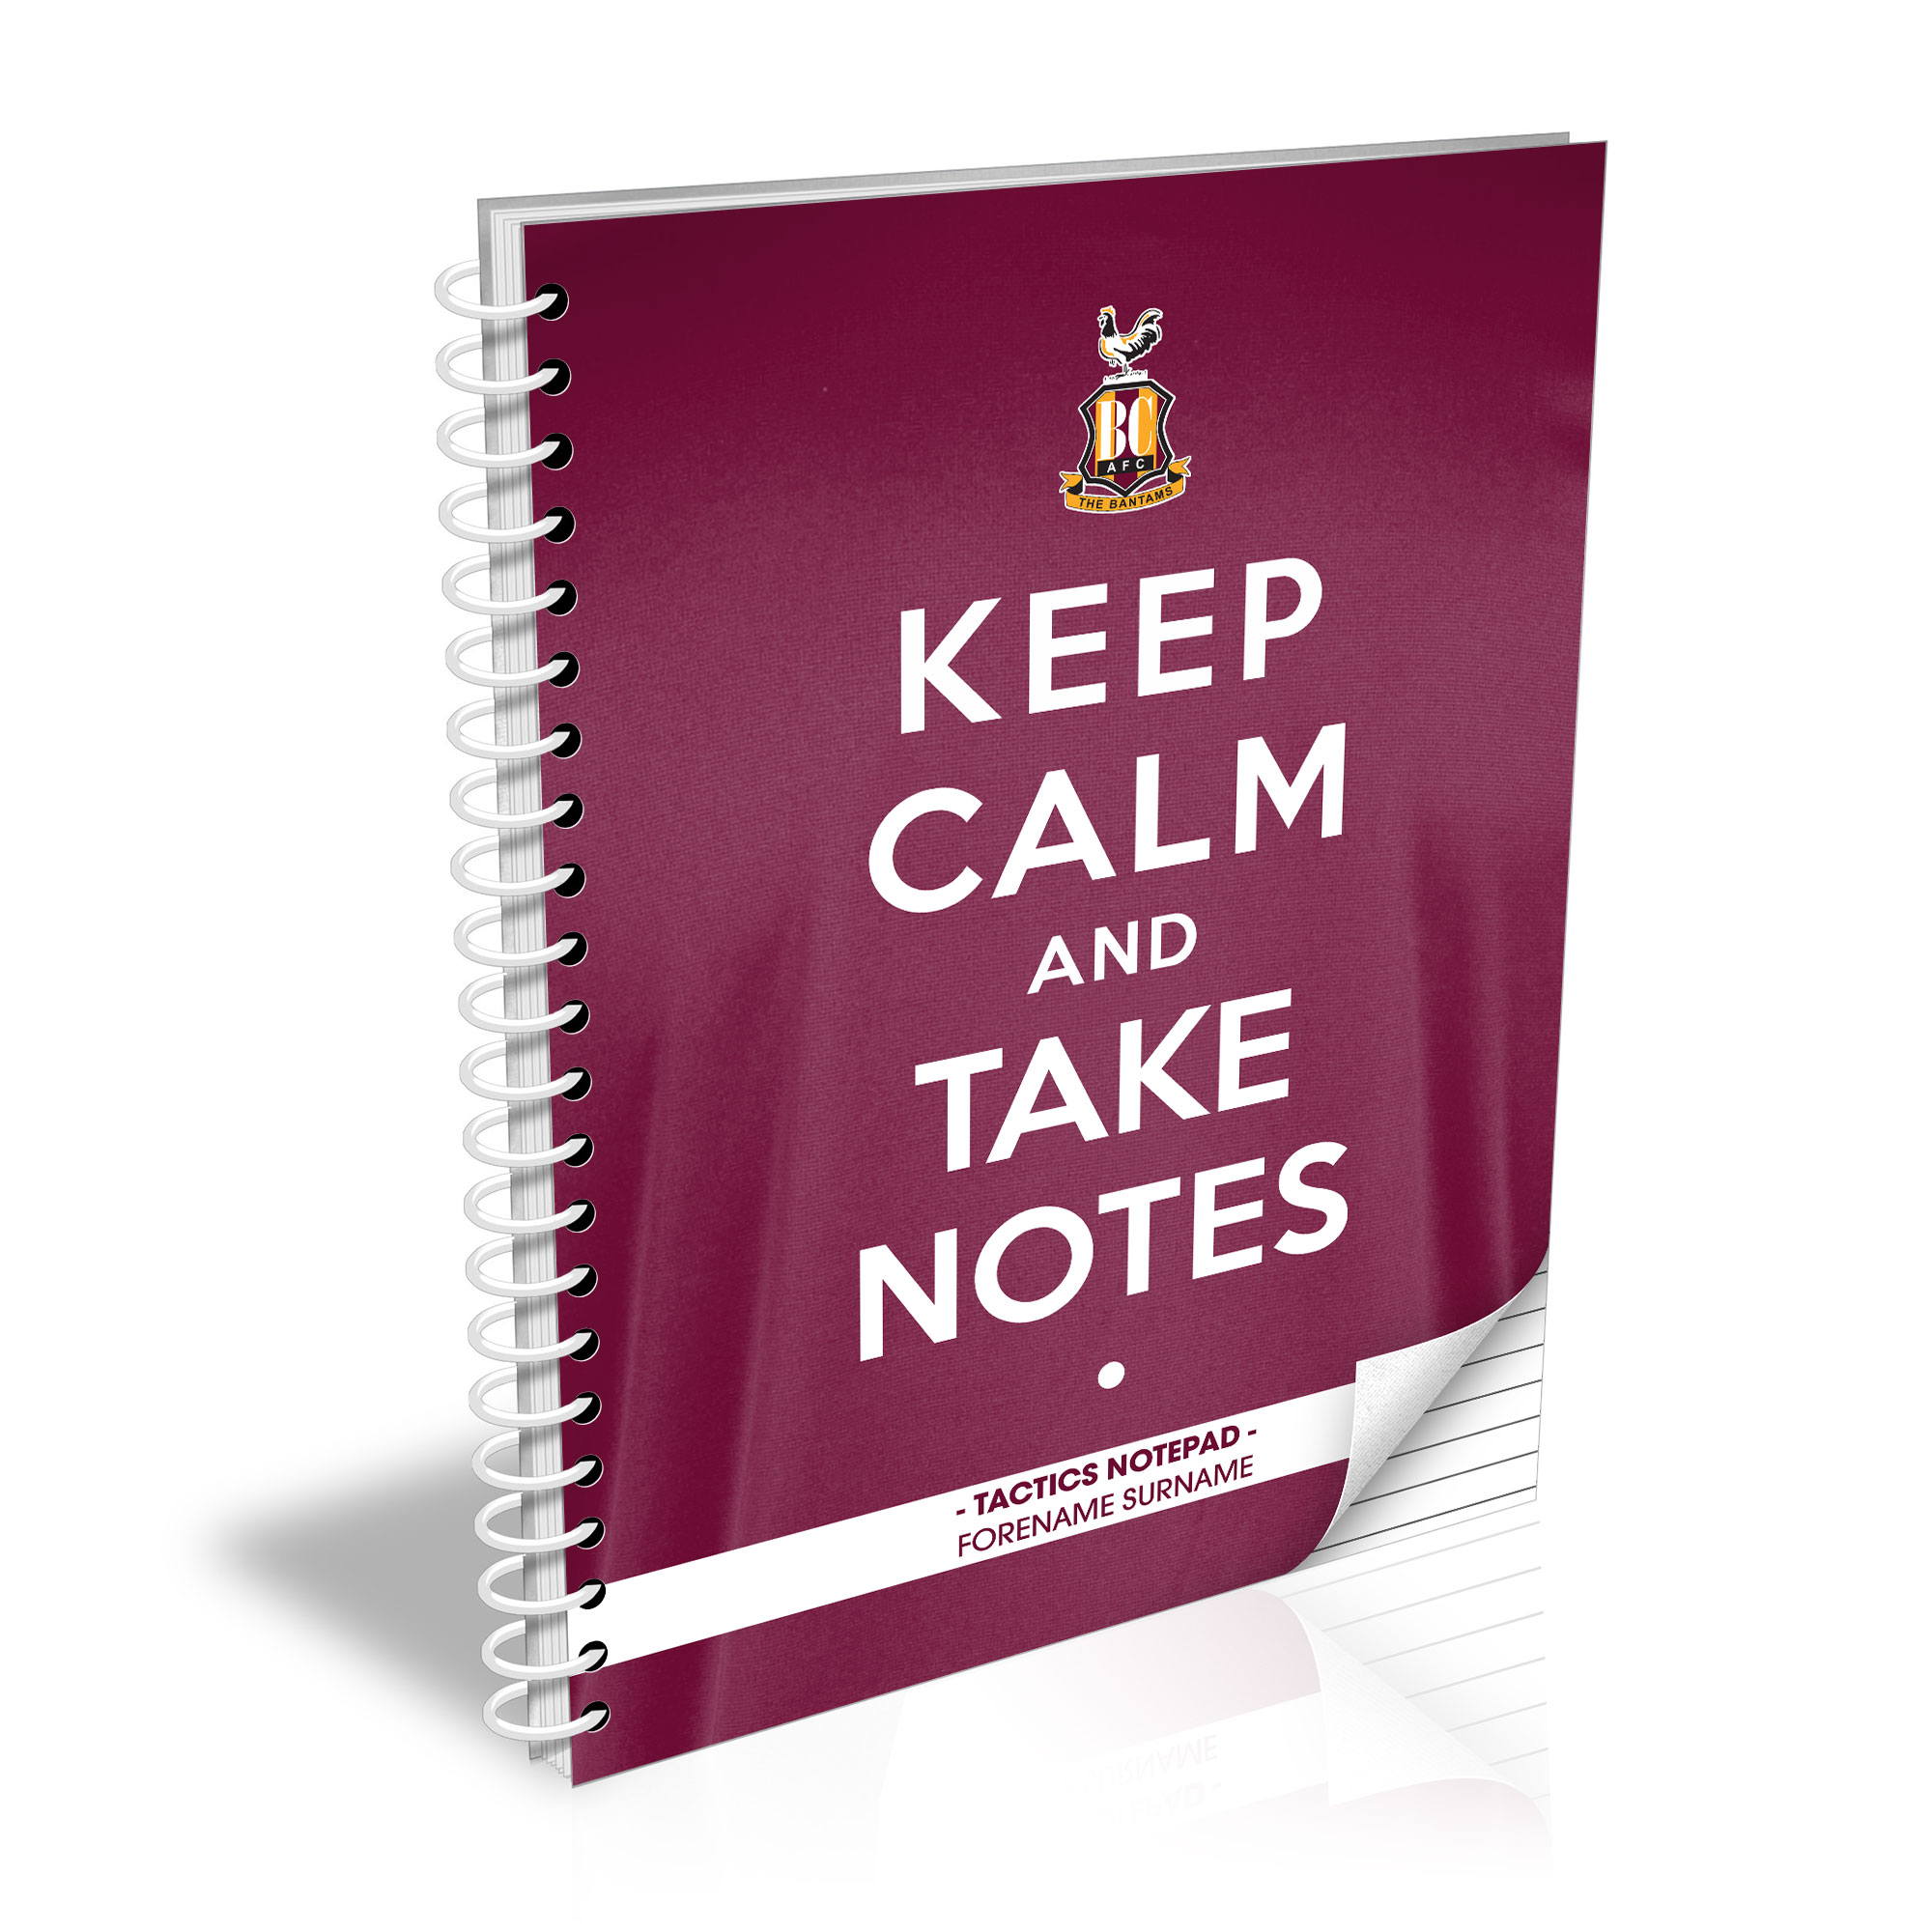 Bradford City AFC Keep Calm Notebook